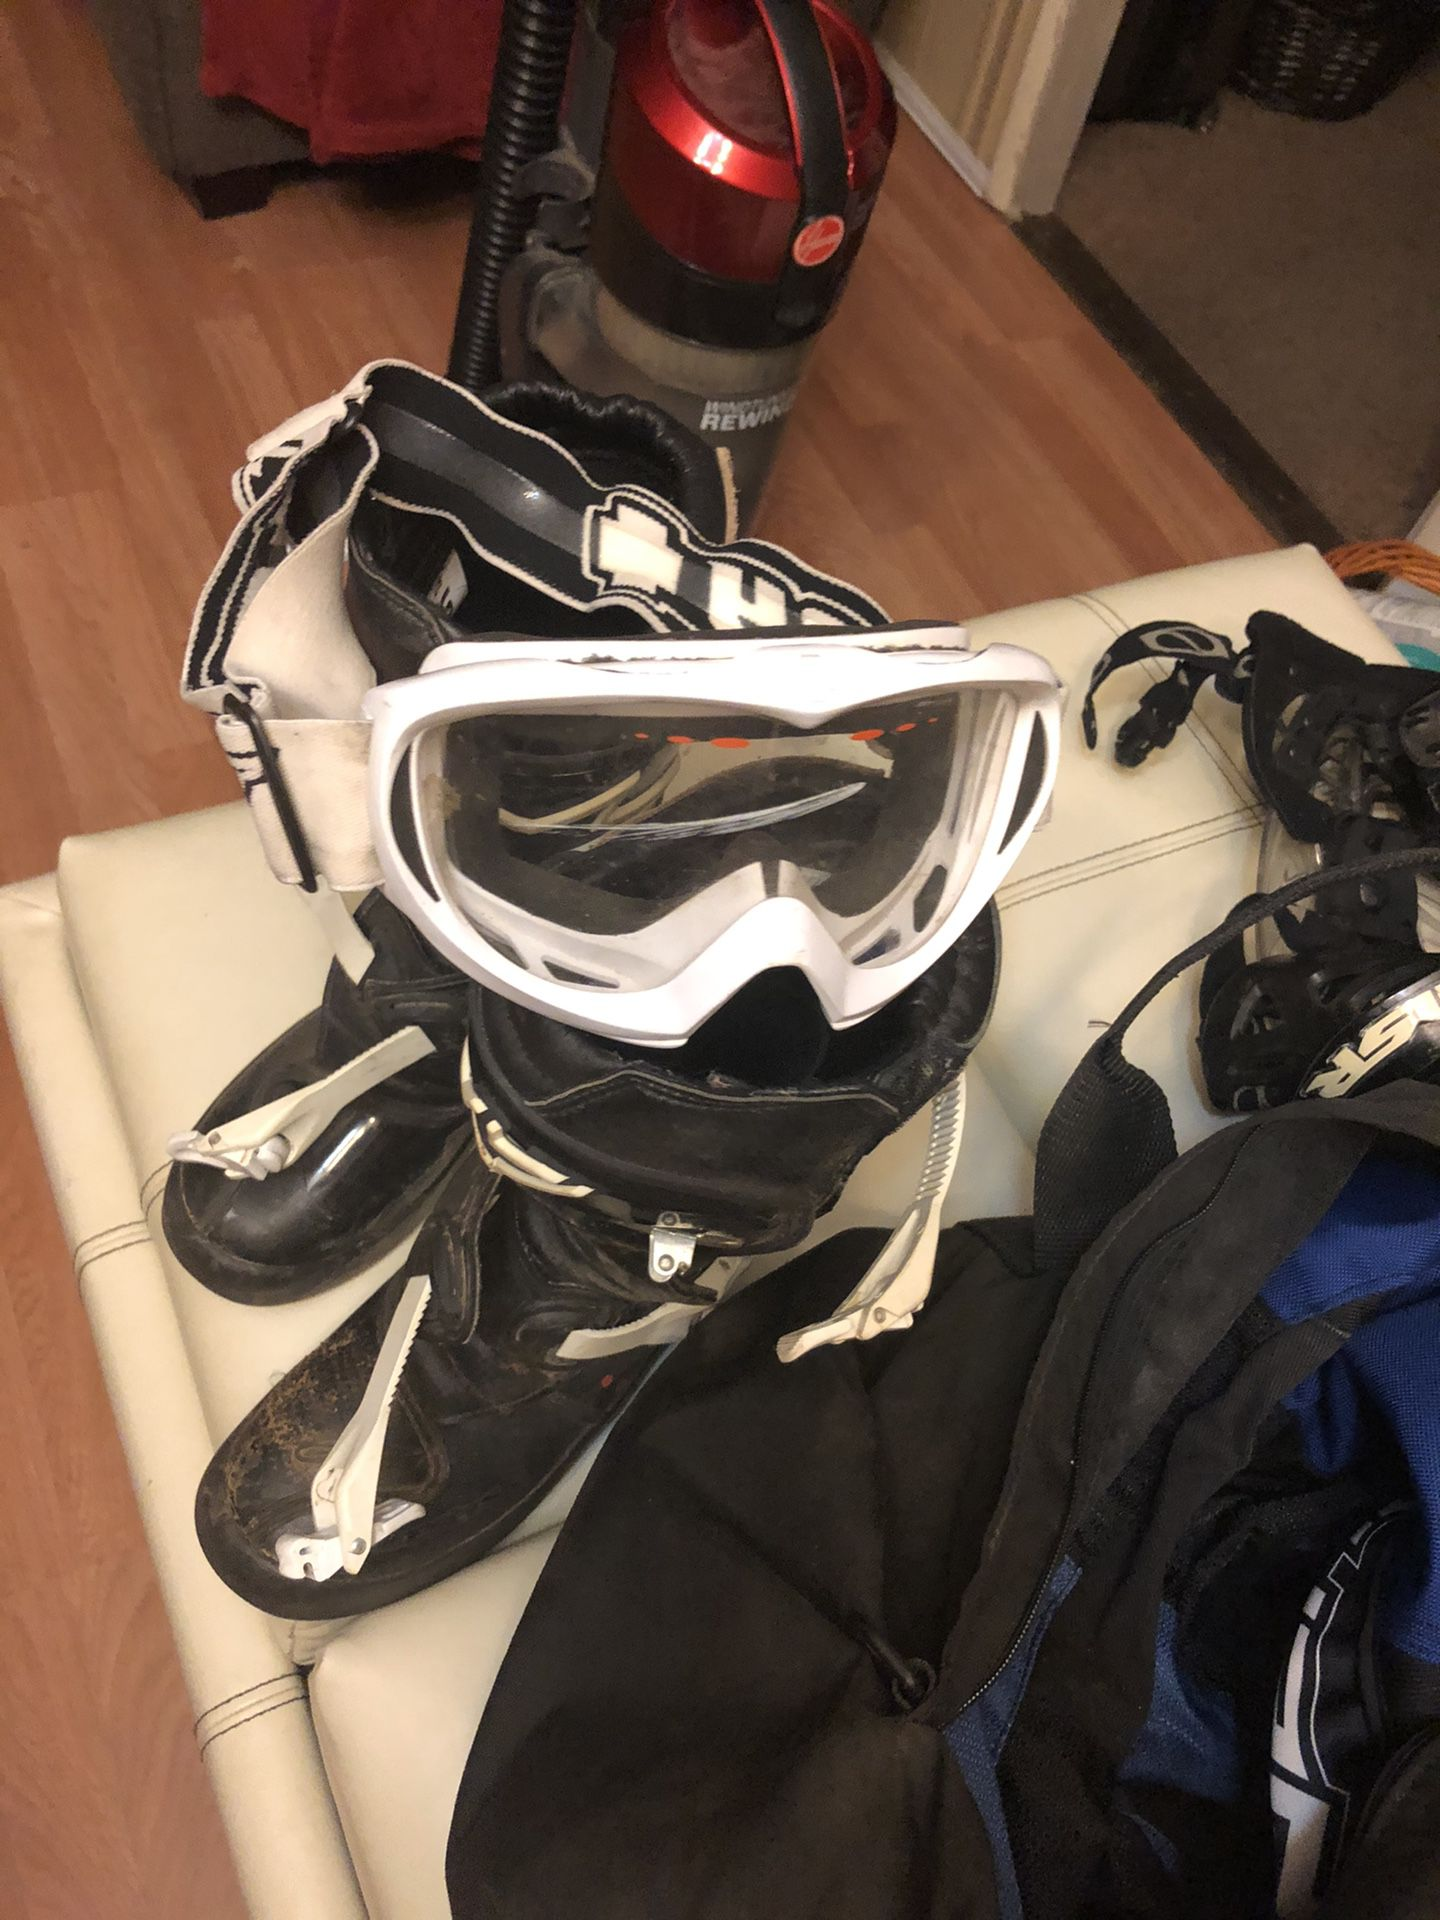 Motorcycle equipment 10T